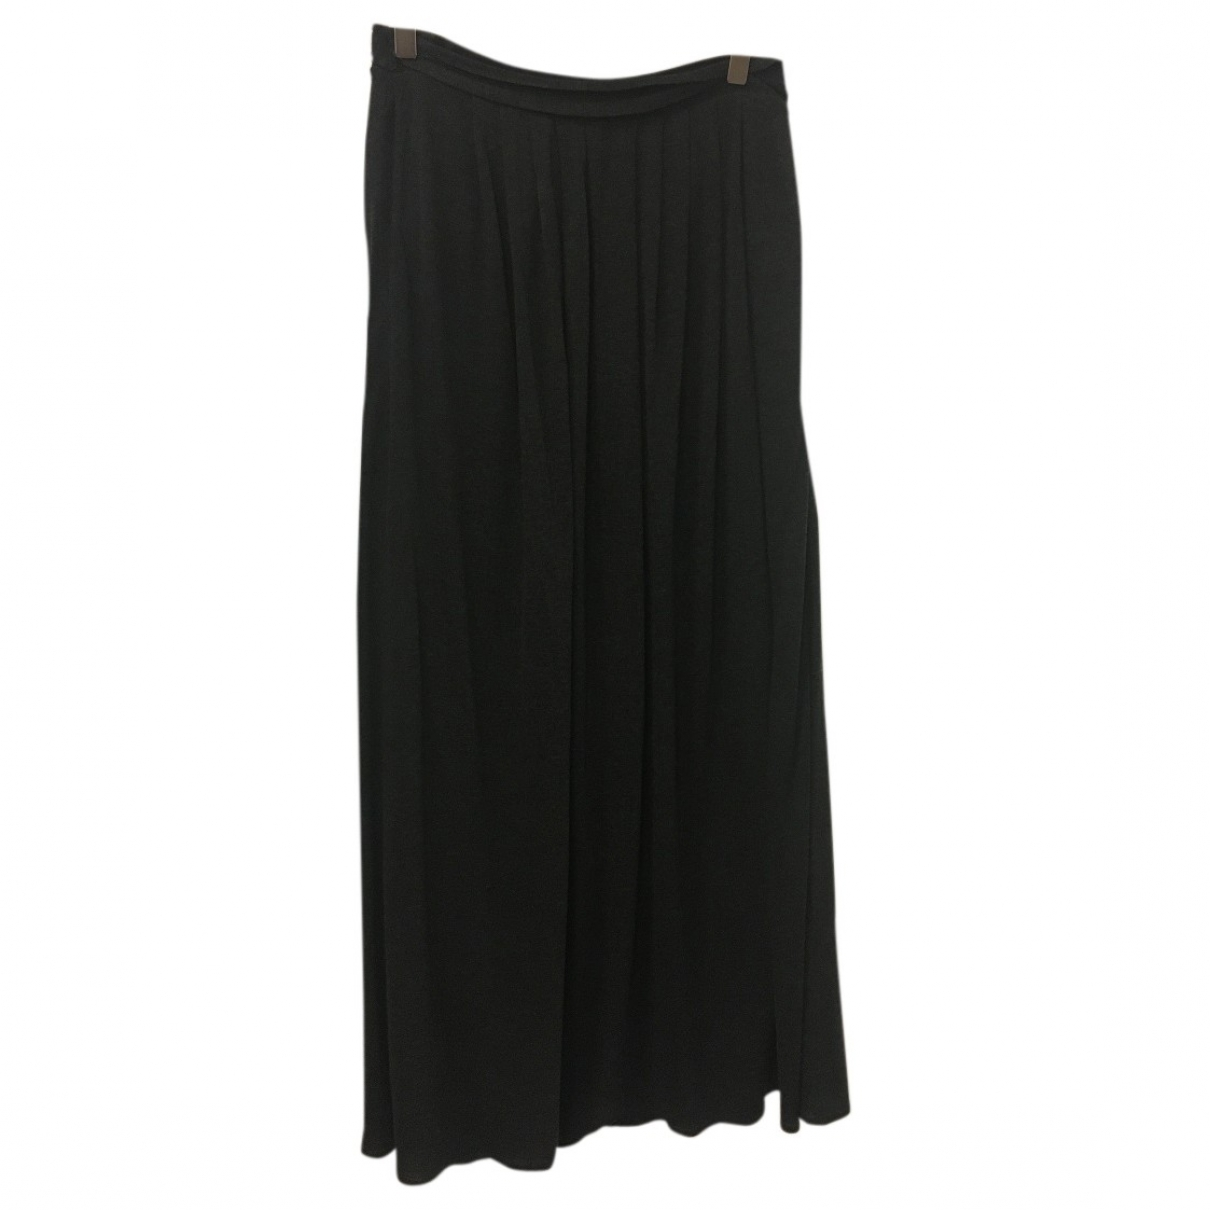 Max Mara Weekend \N Anthracite Wool skirt for Women XS International